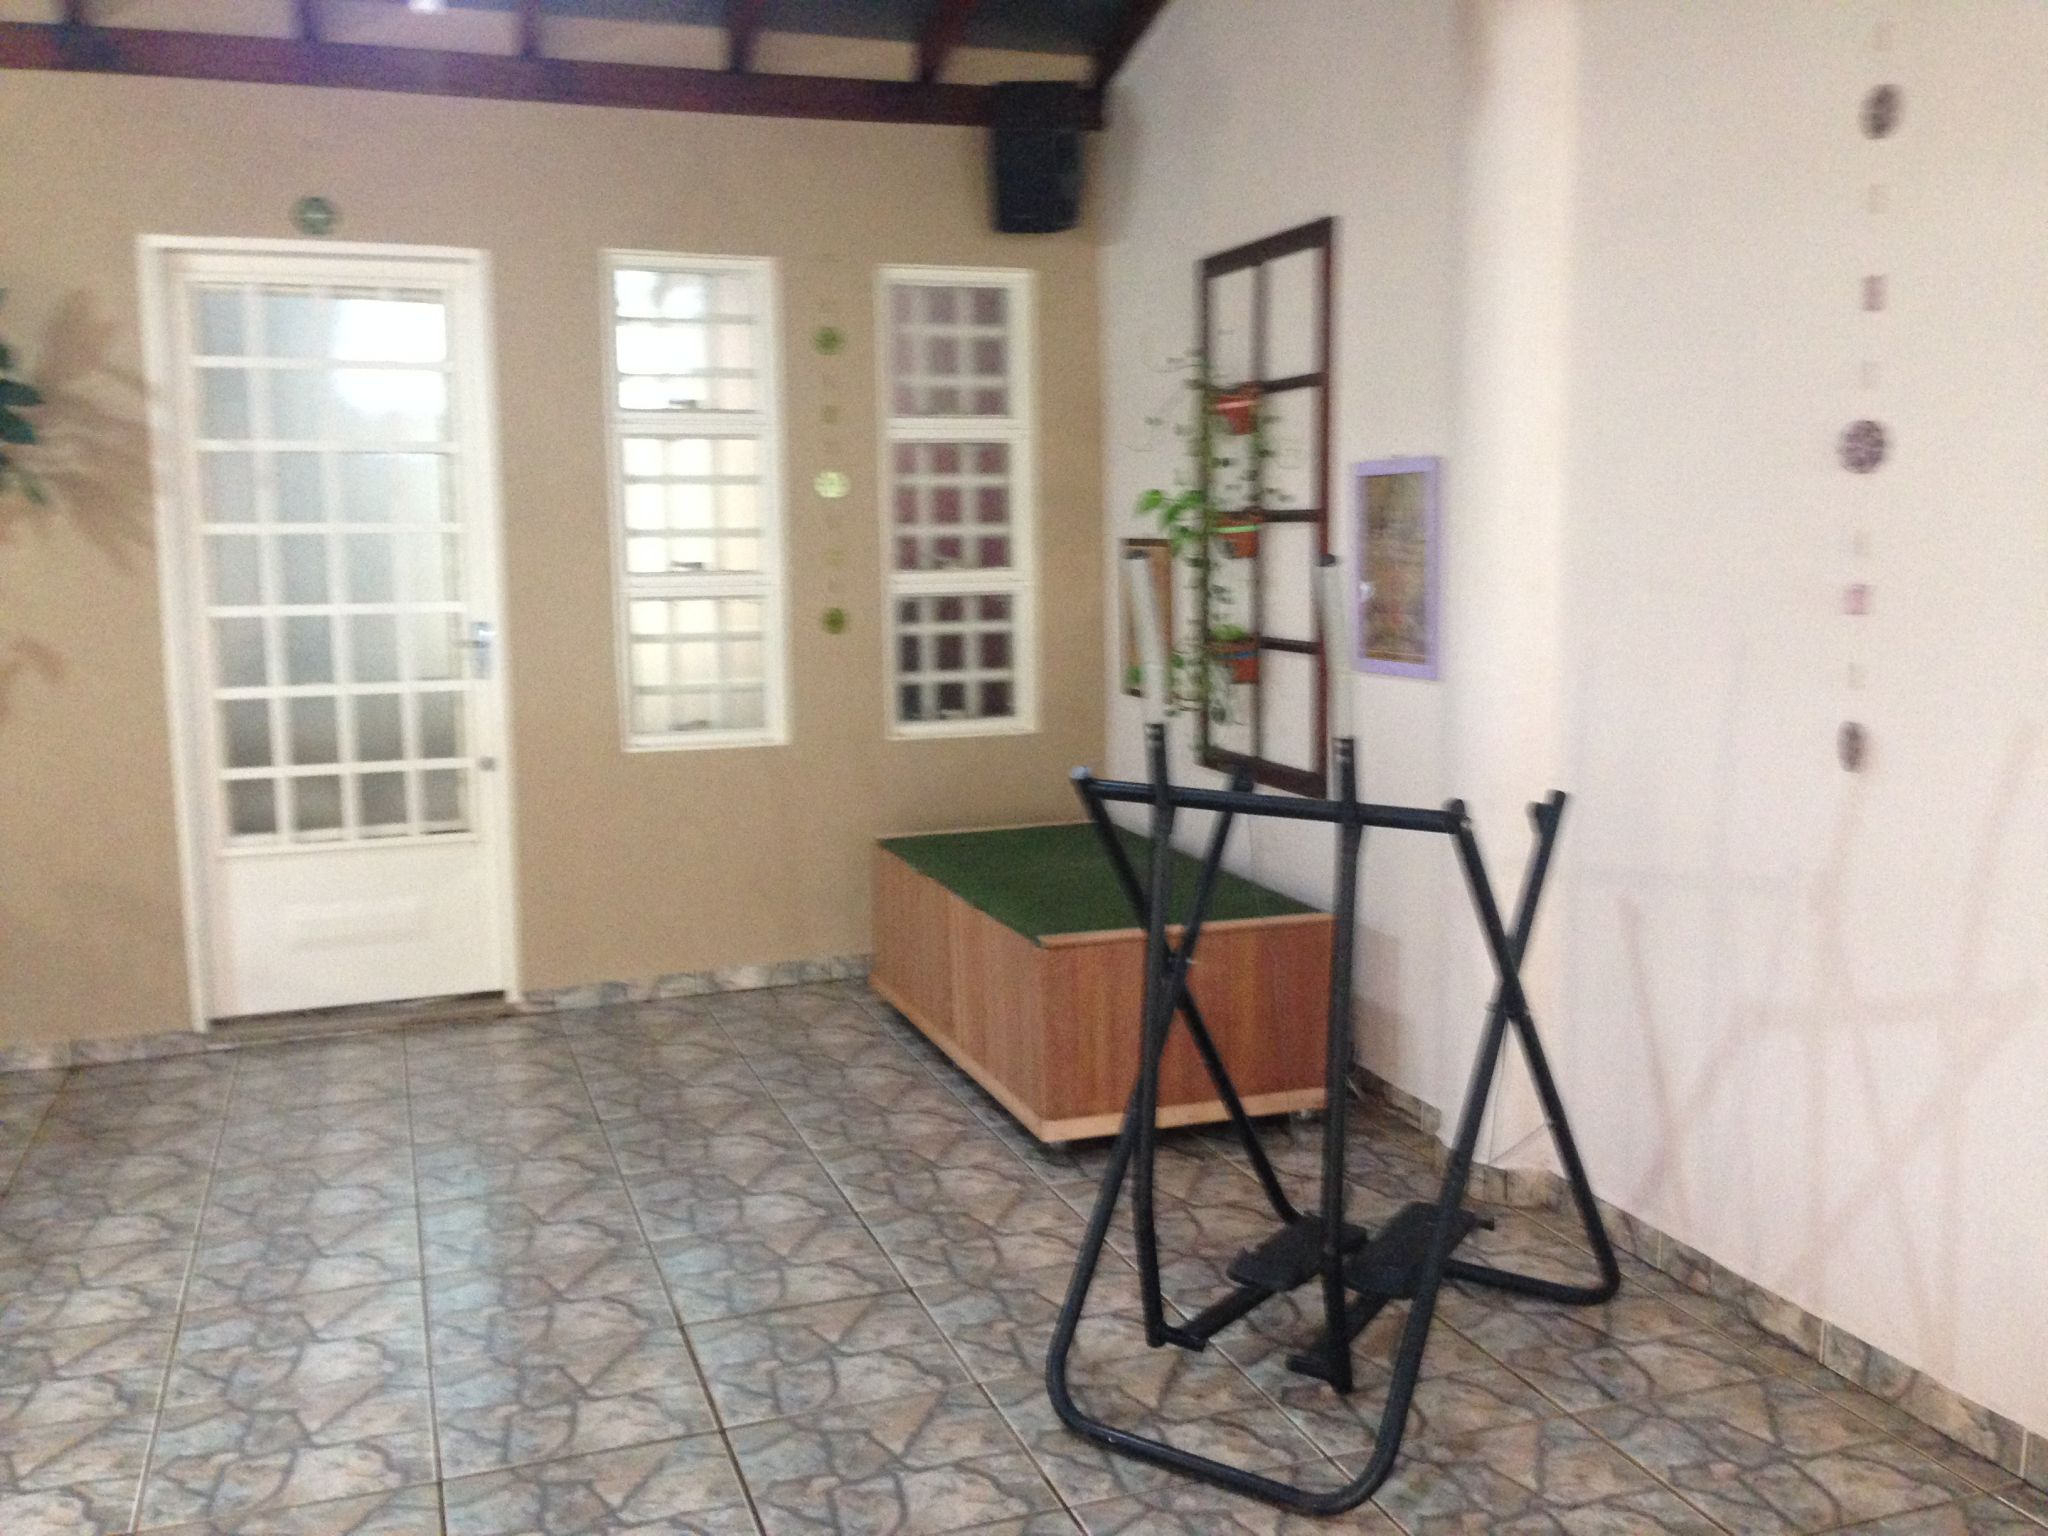 237 - Casa Jardim Palmares 200 m²